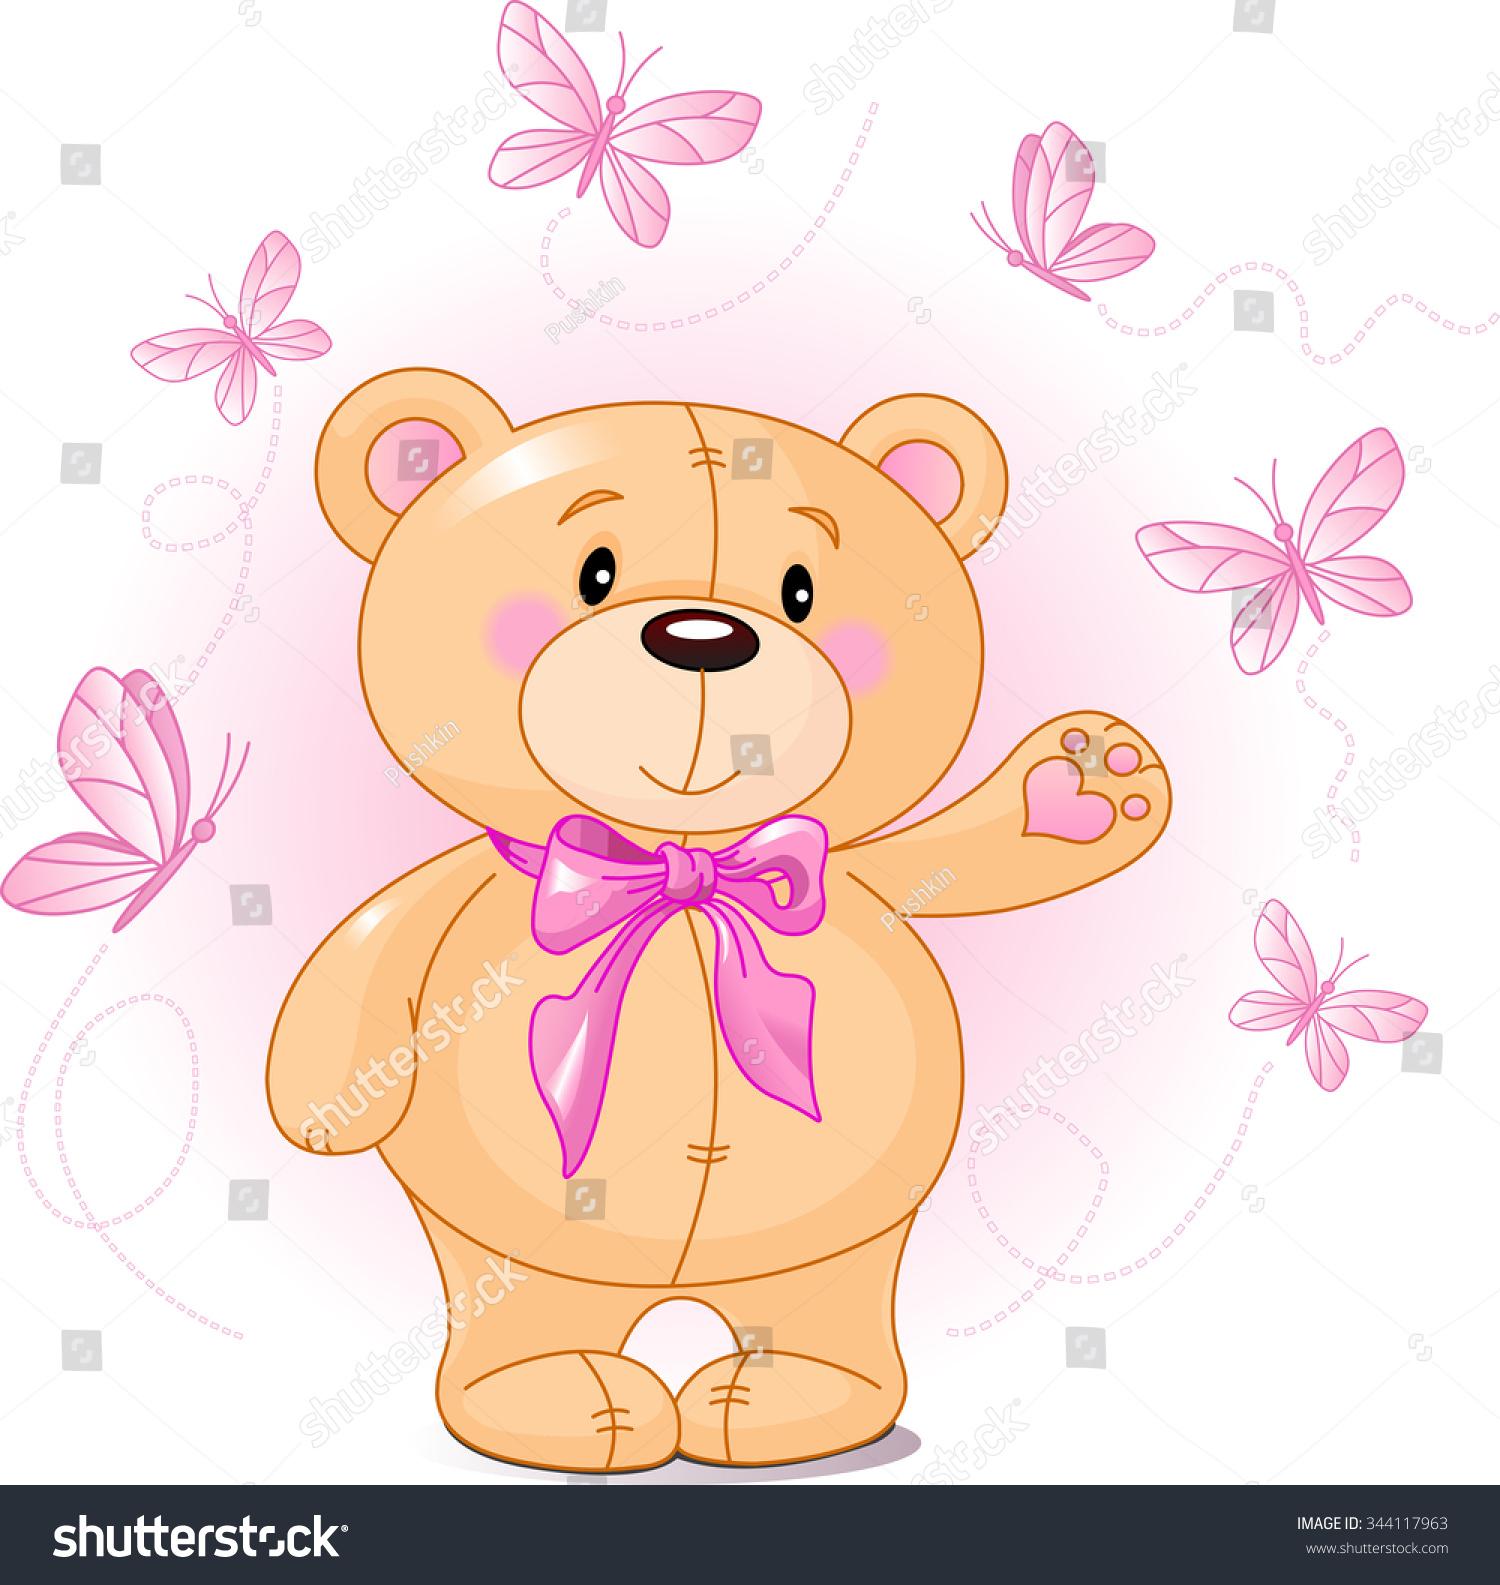 Very Cute Teddy Bear Waiving Hello Stock Illustration ...